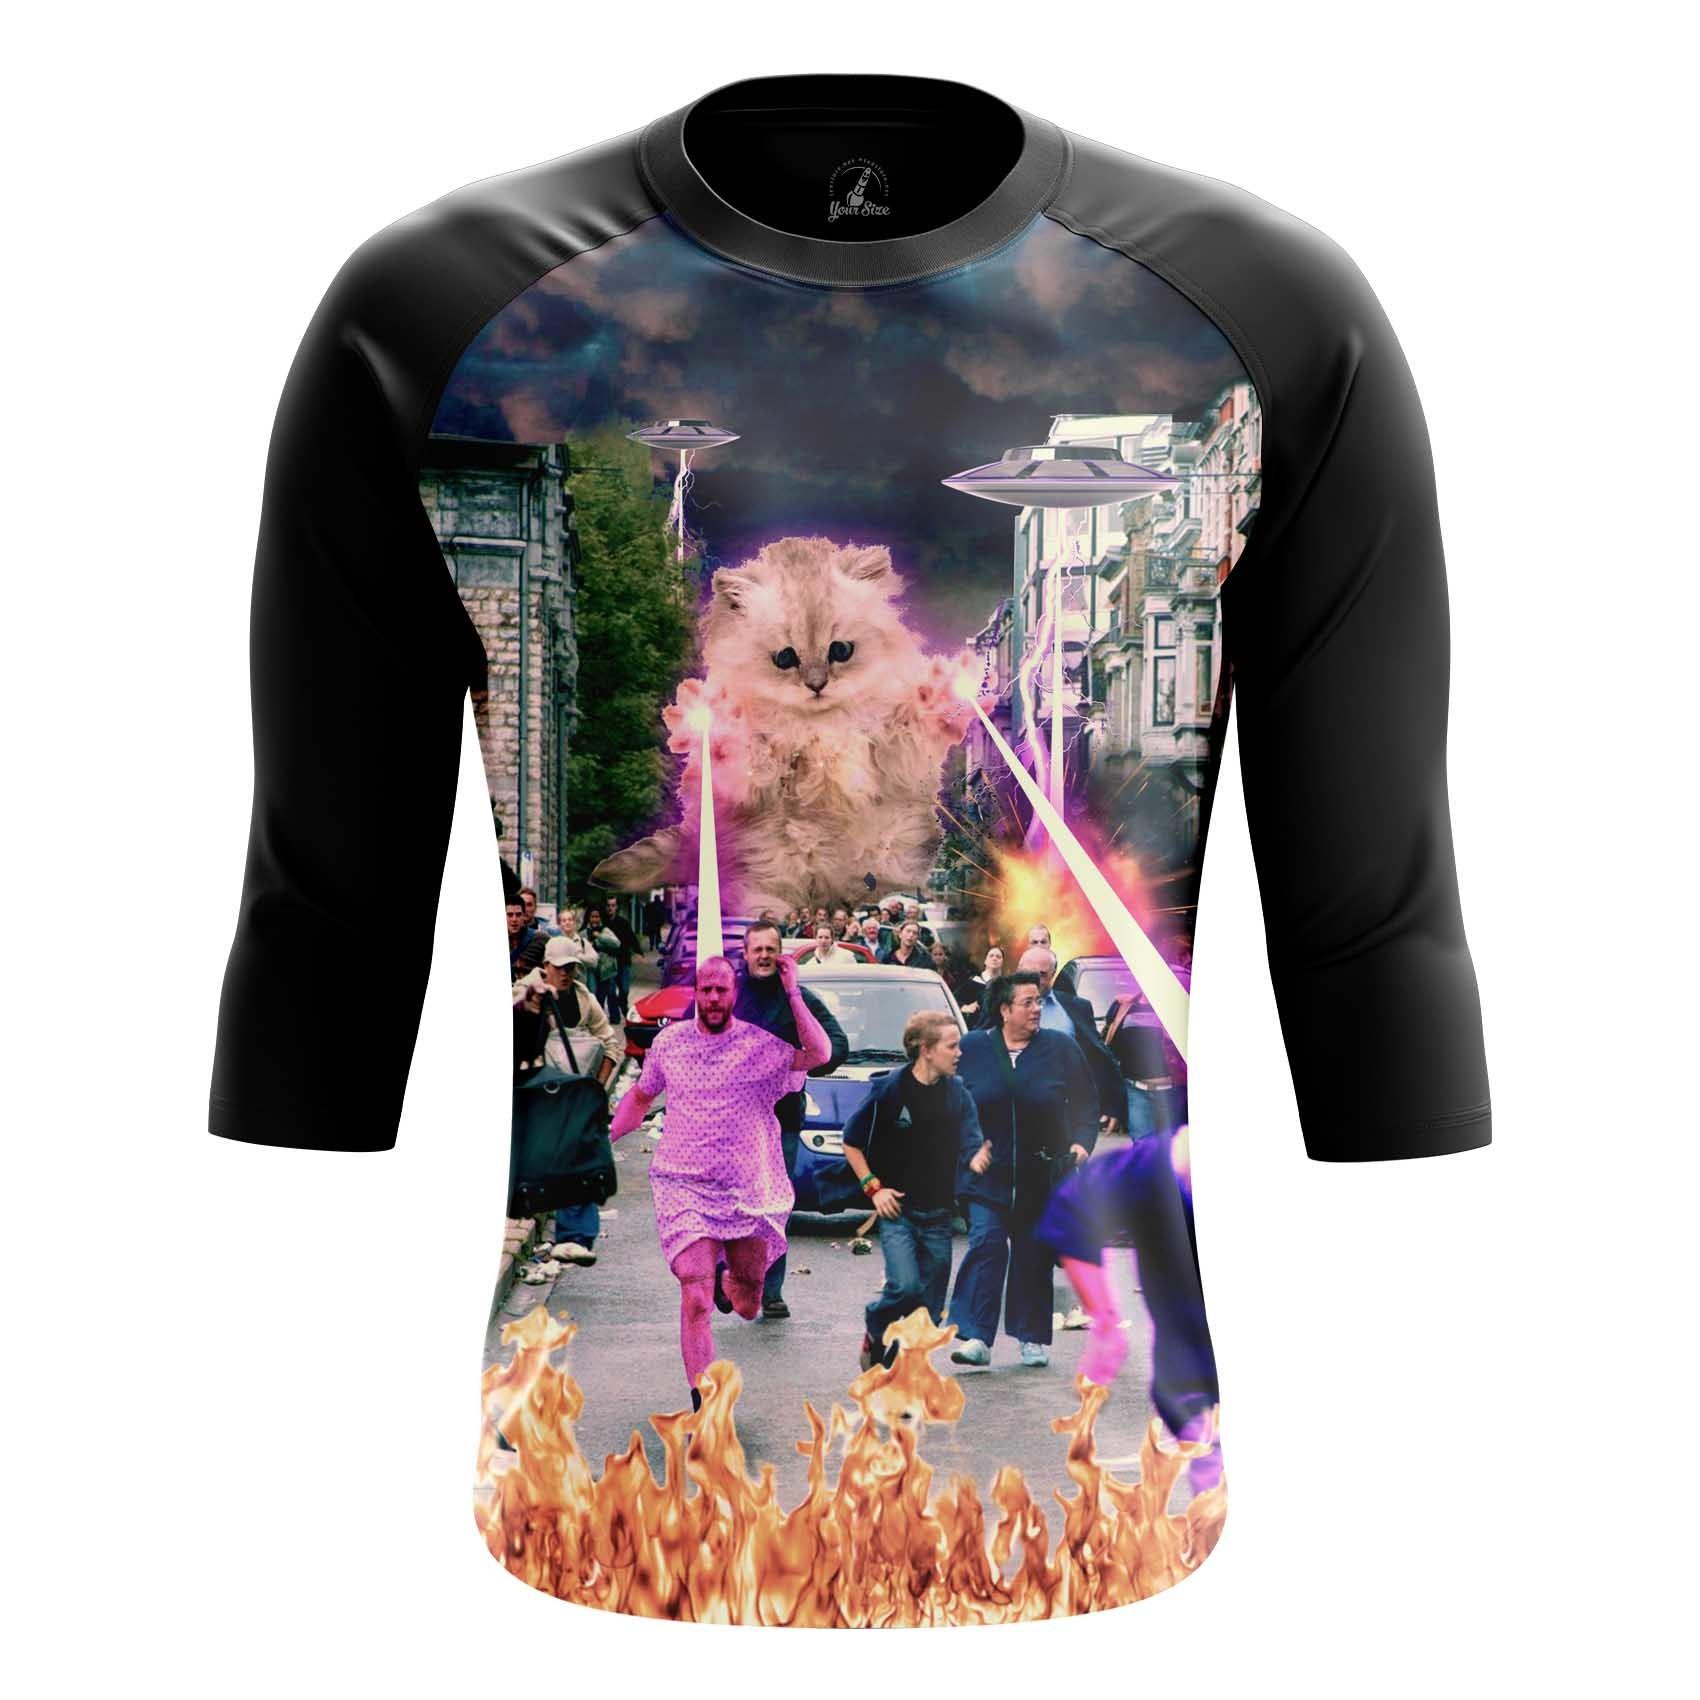 Merch Men'S T-Shirt Kitten No One Loved Laser Cat Crash Fun